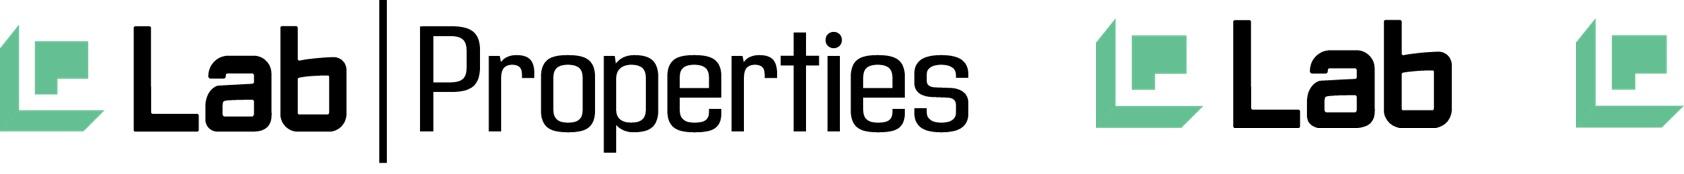 Lab full signature logo and icon